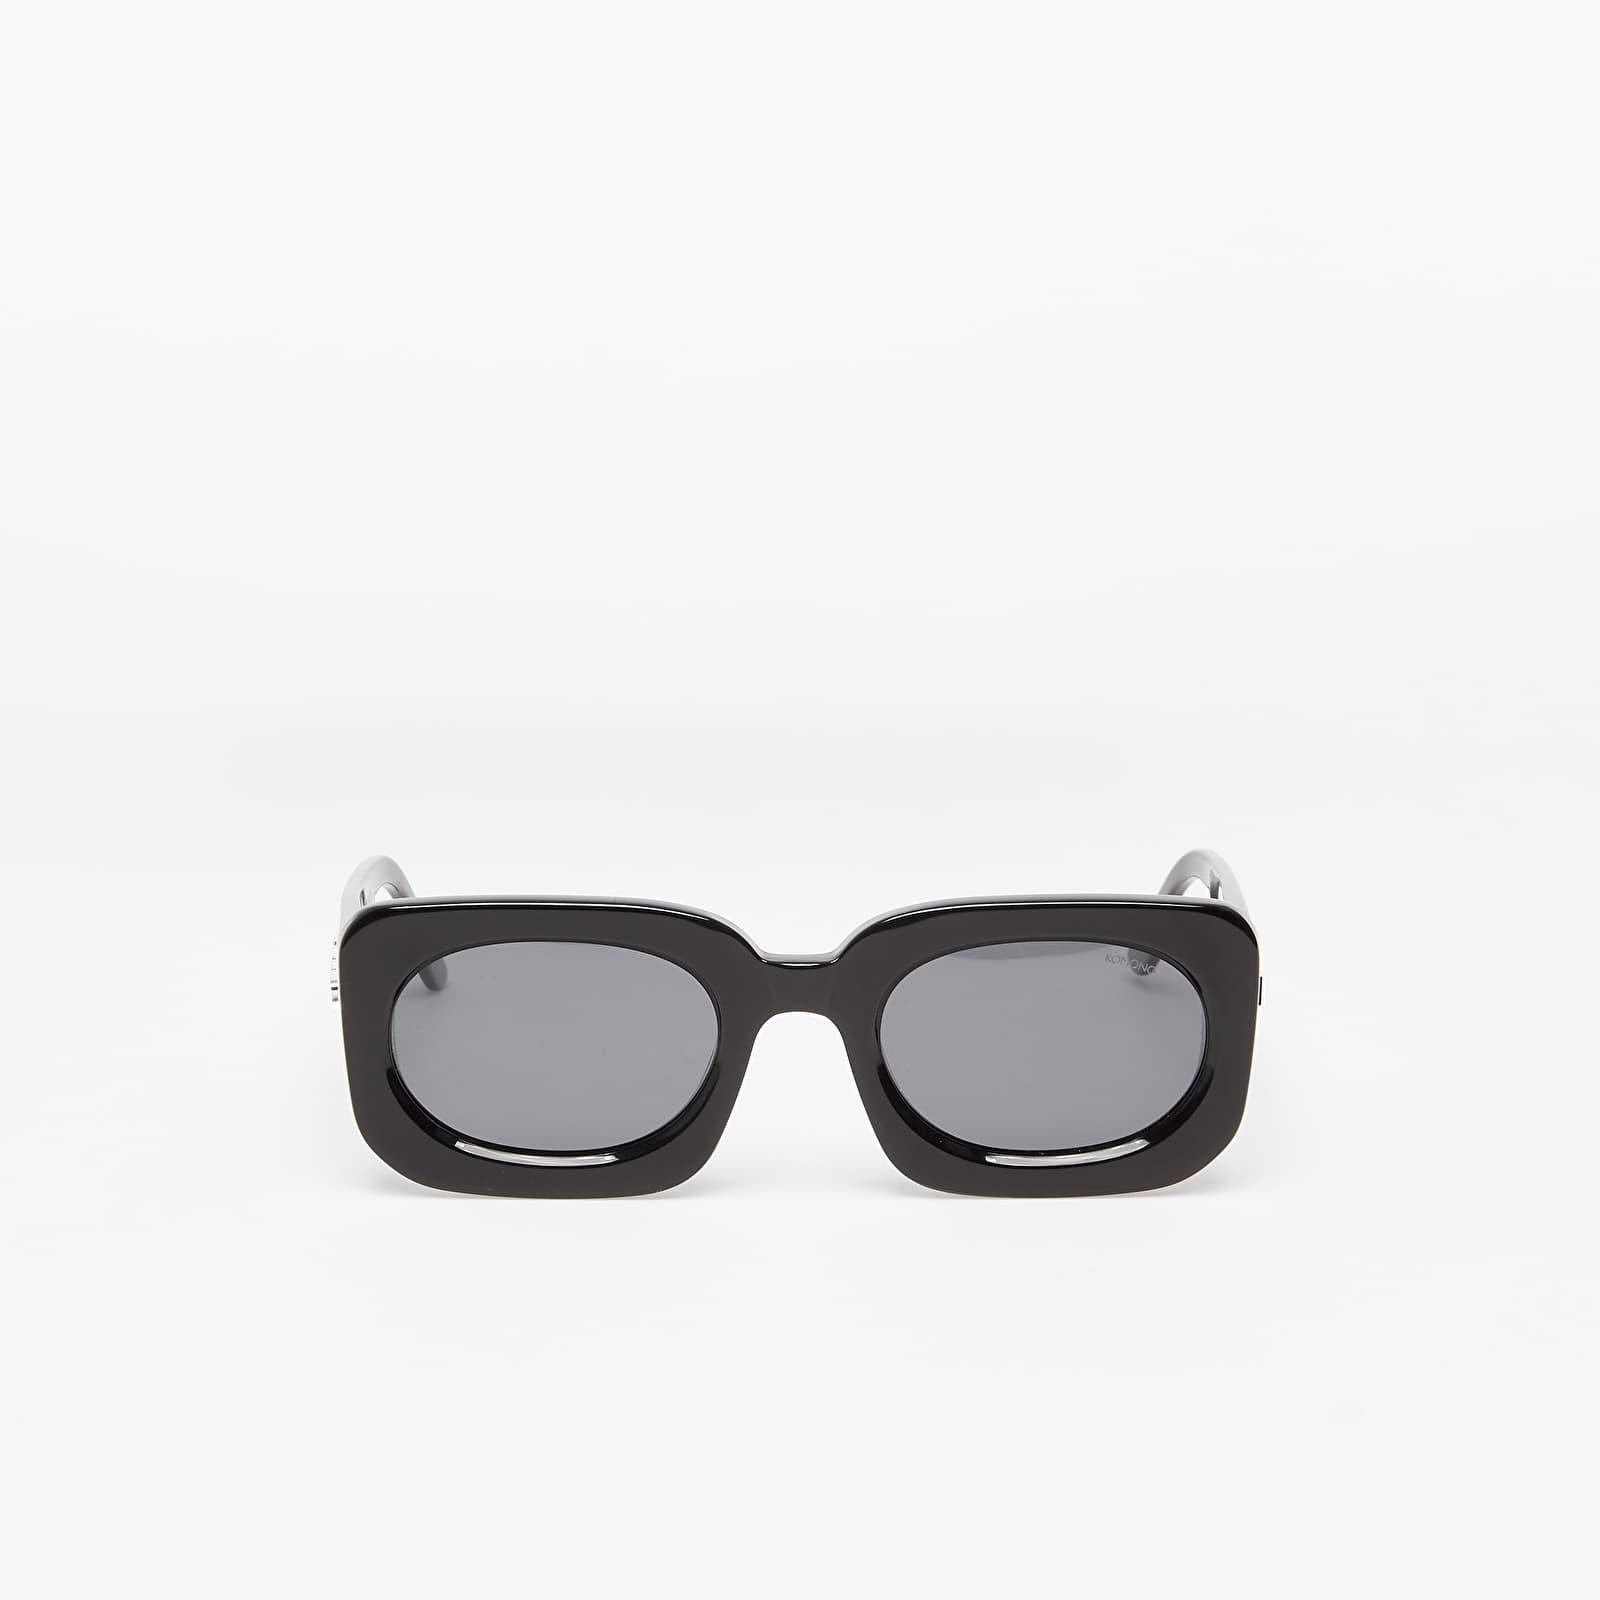 Napszemüvegek KOMONO x Daily Paper Glasses Black